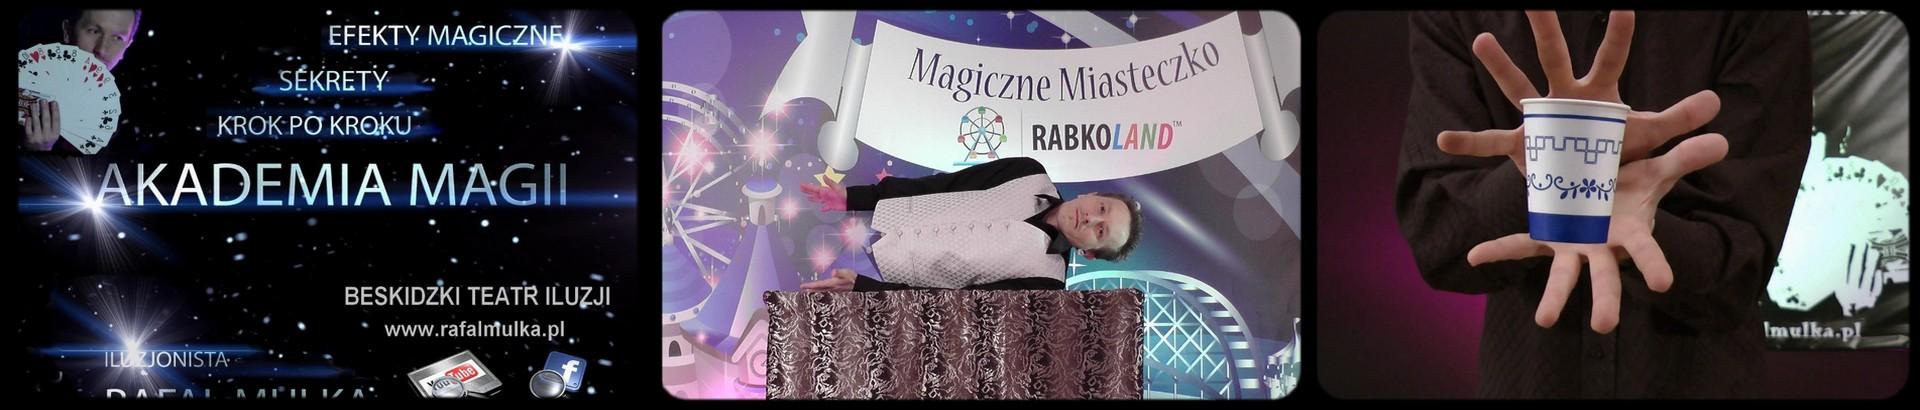 akademia magii iluzjonista rafal mulka